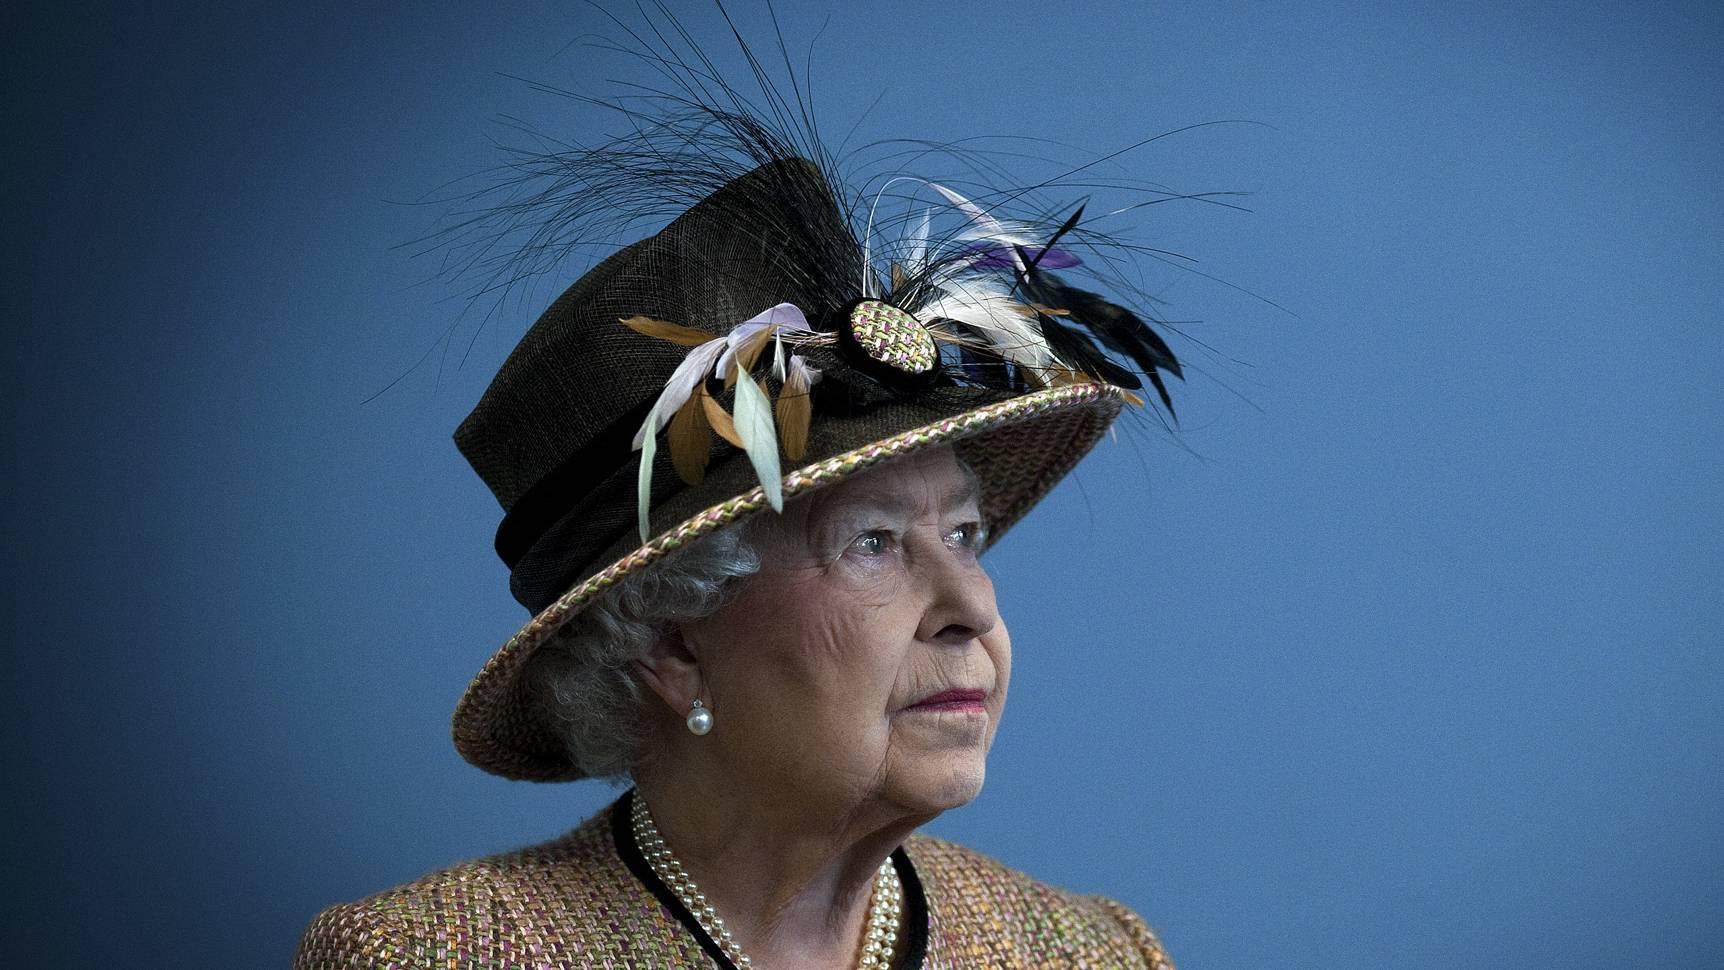 """How is it possible?"" Intruder breaks into Buckingham Palace"